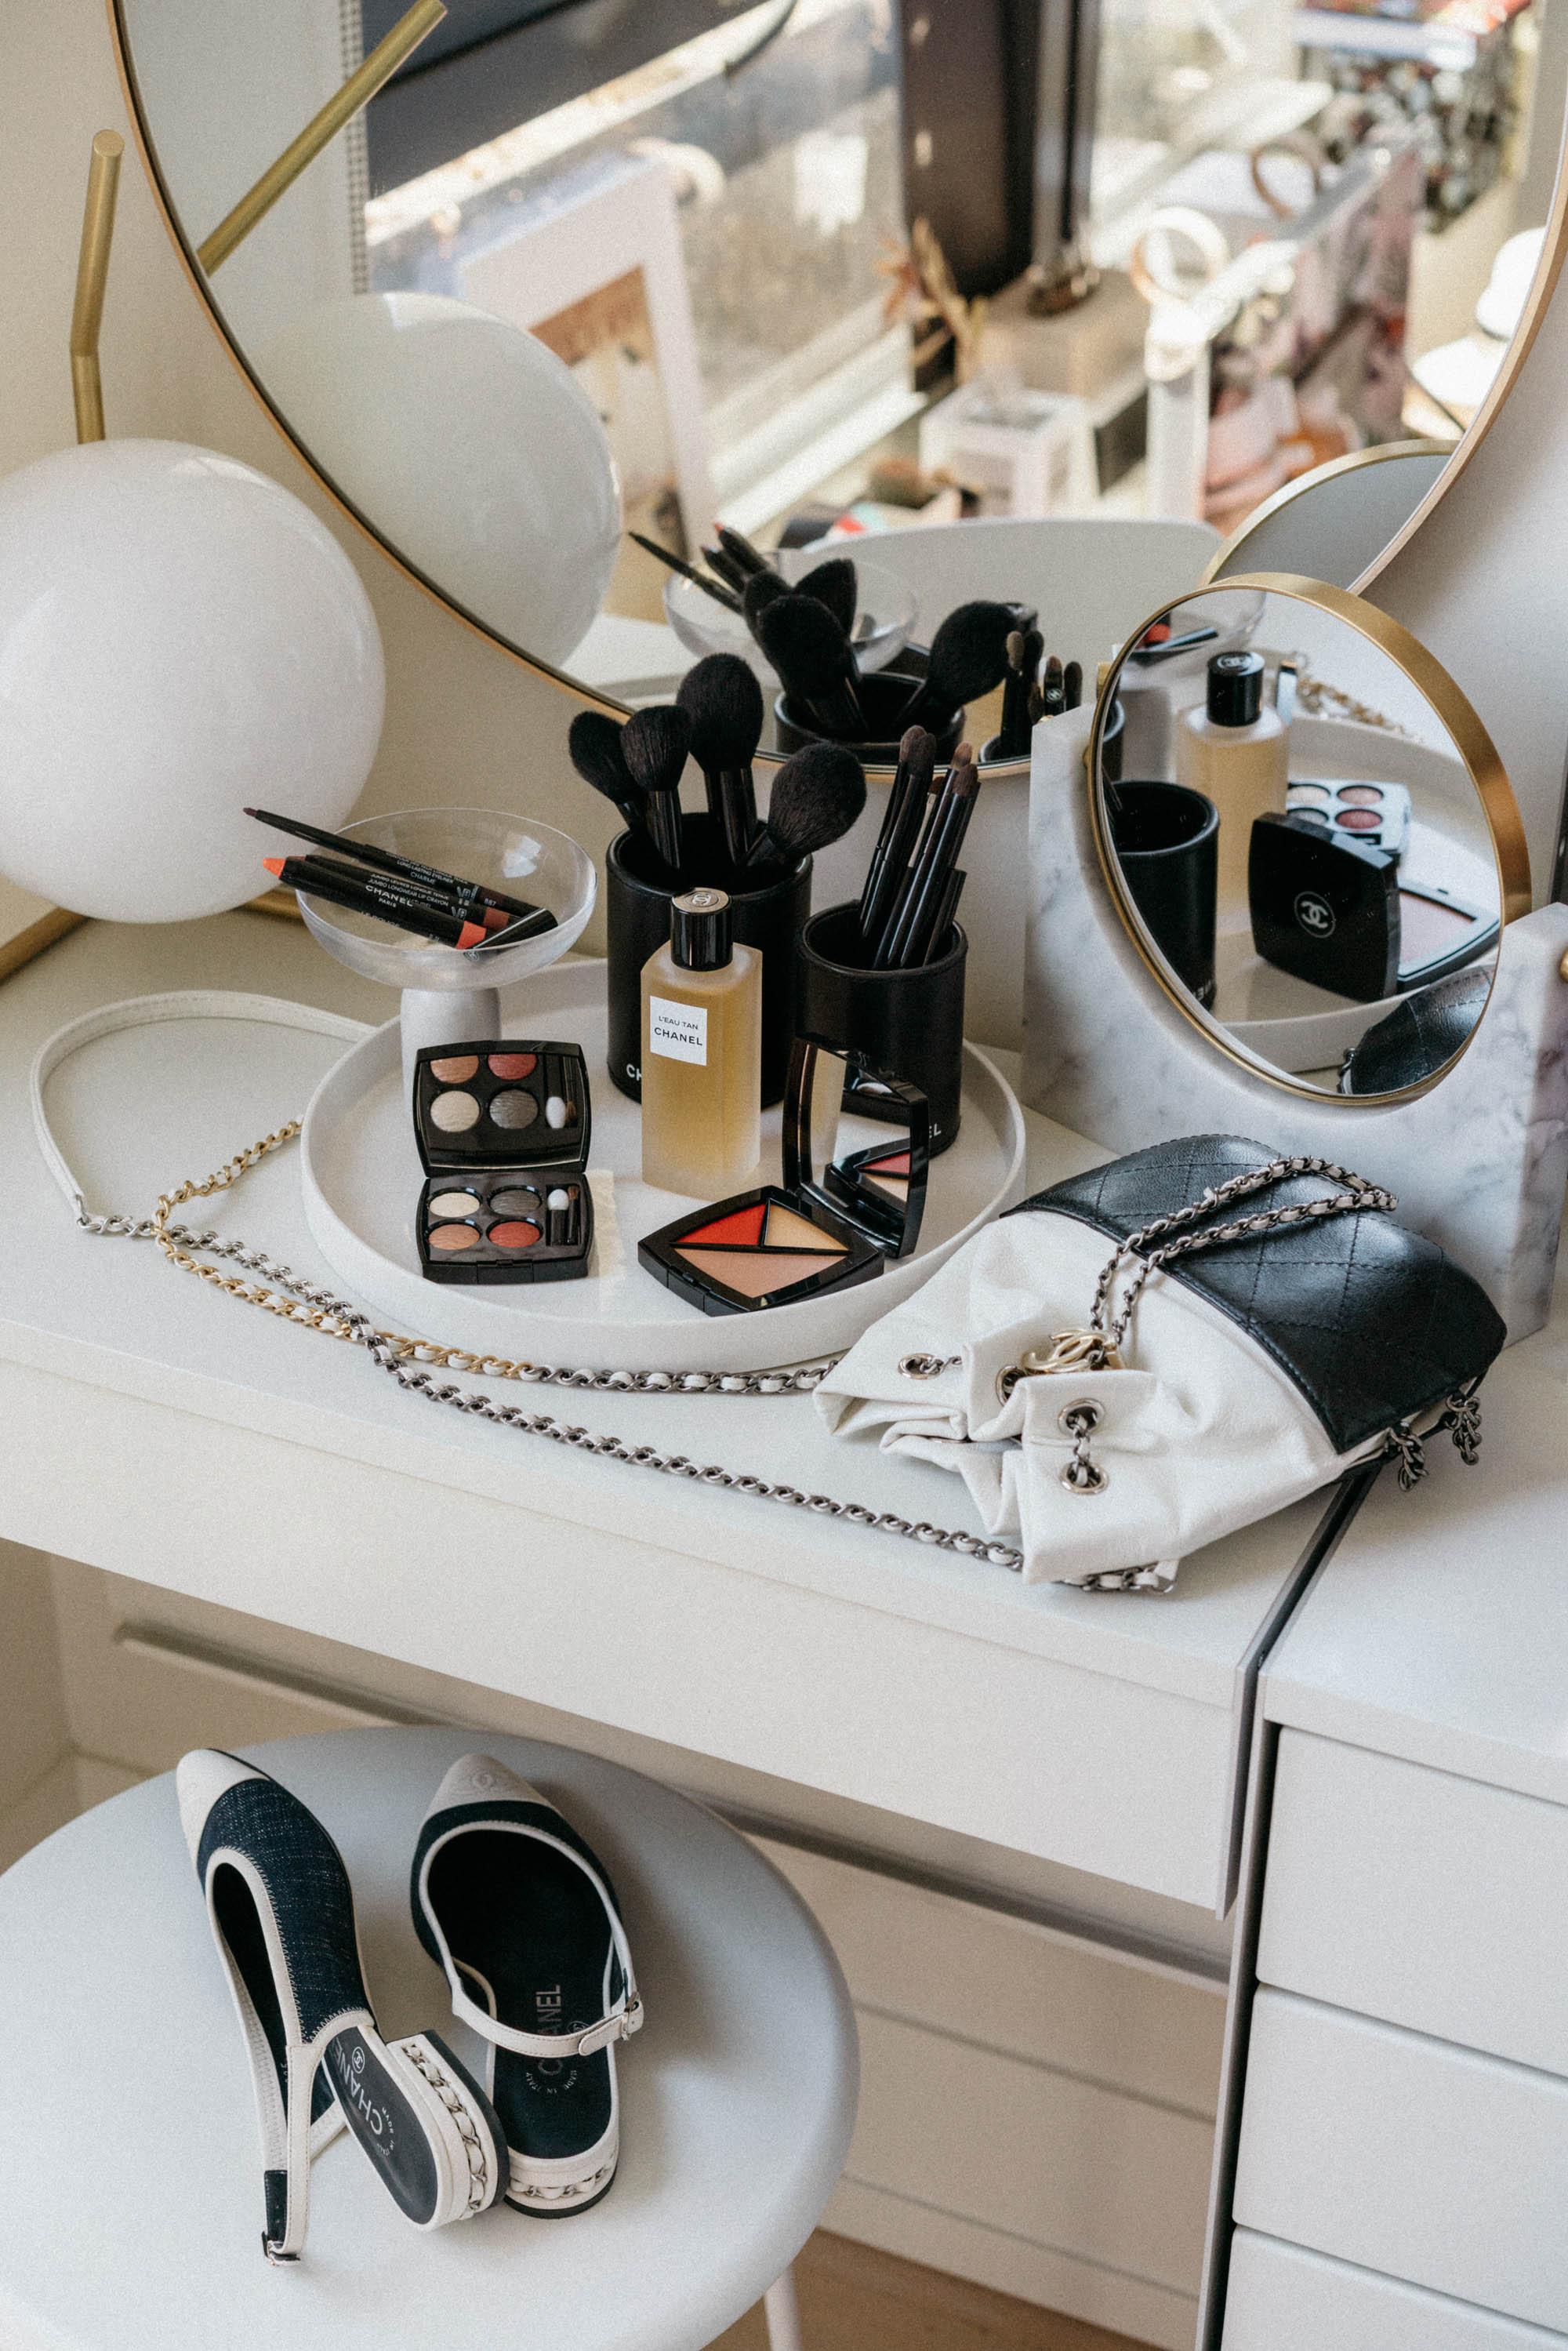 Chanel Beauty , Chanel Bag, Chanel Shoes,  Menu Mirror